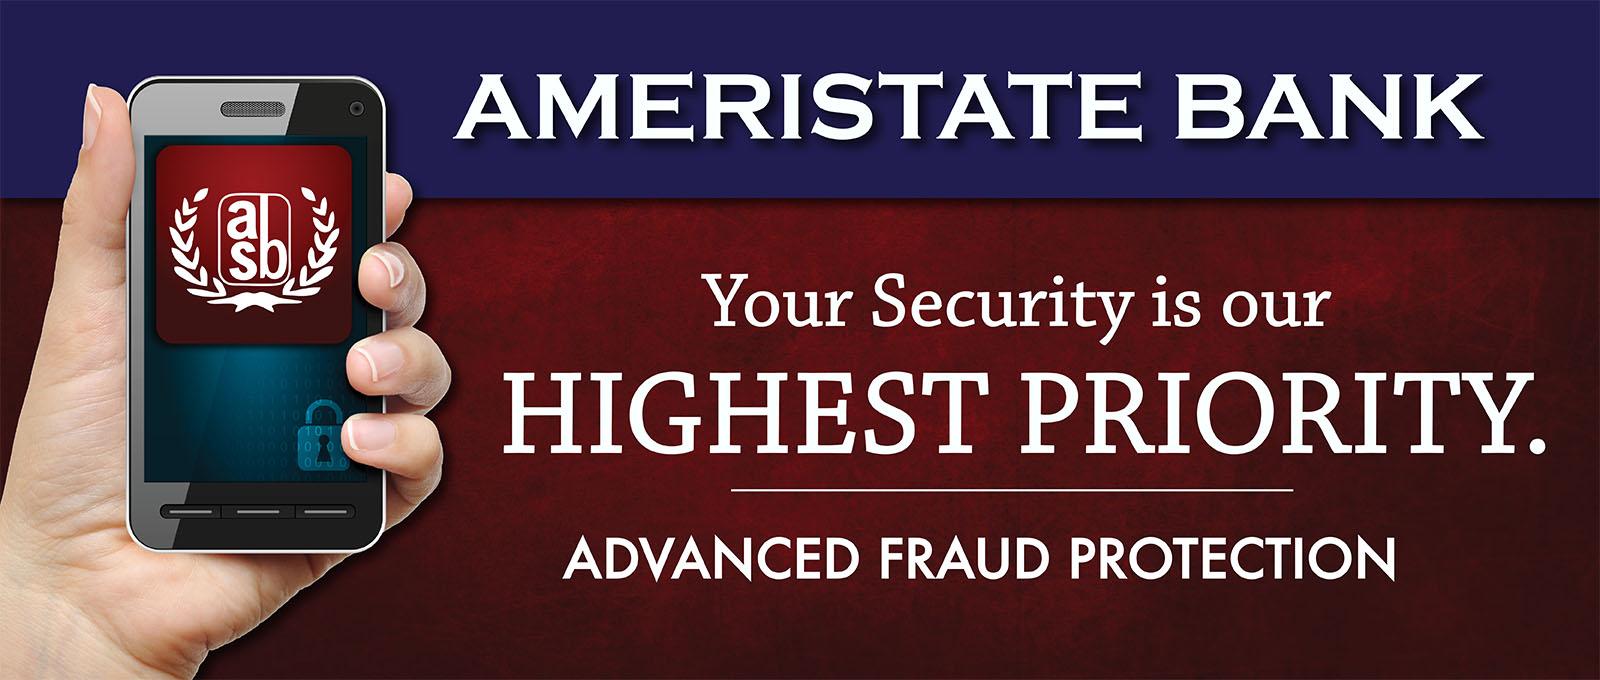 Ameristate Bank Personal Loans